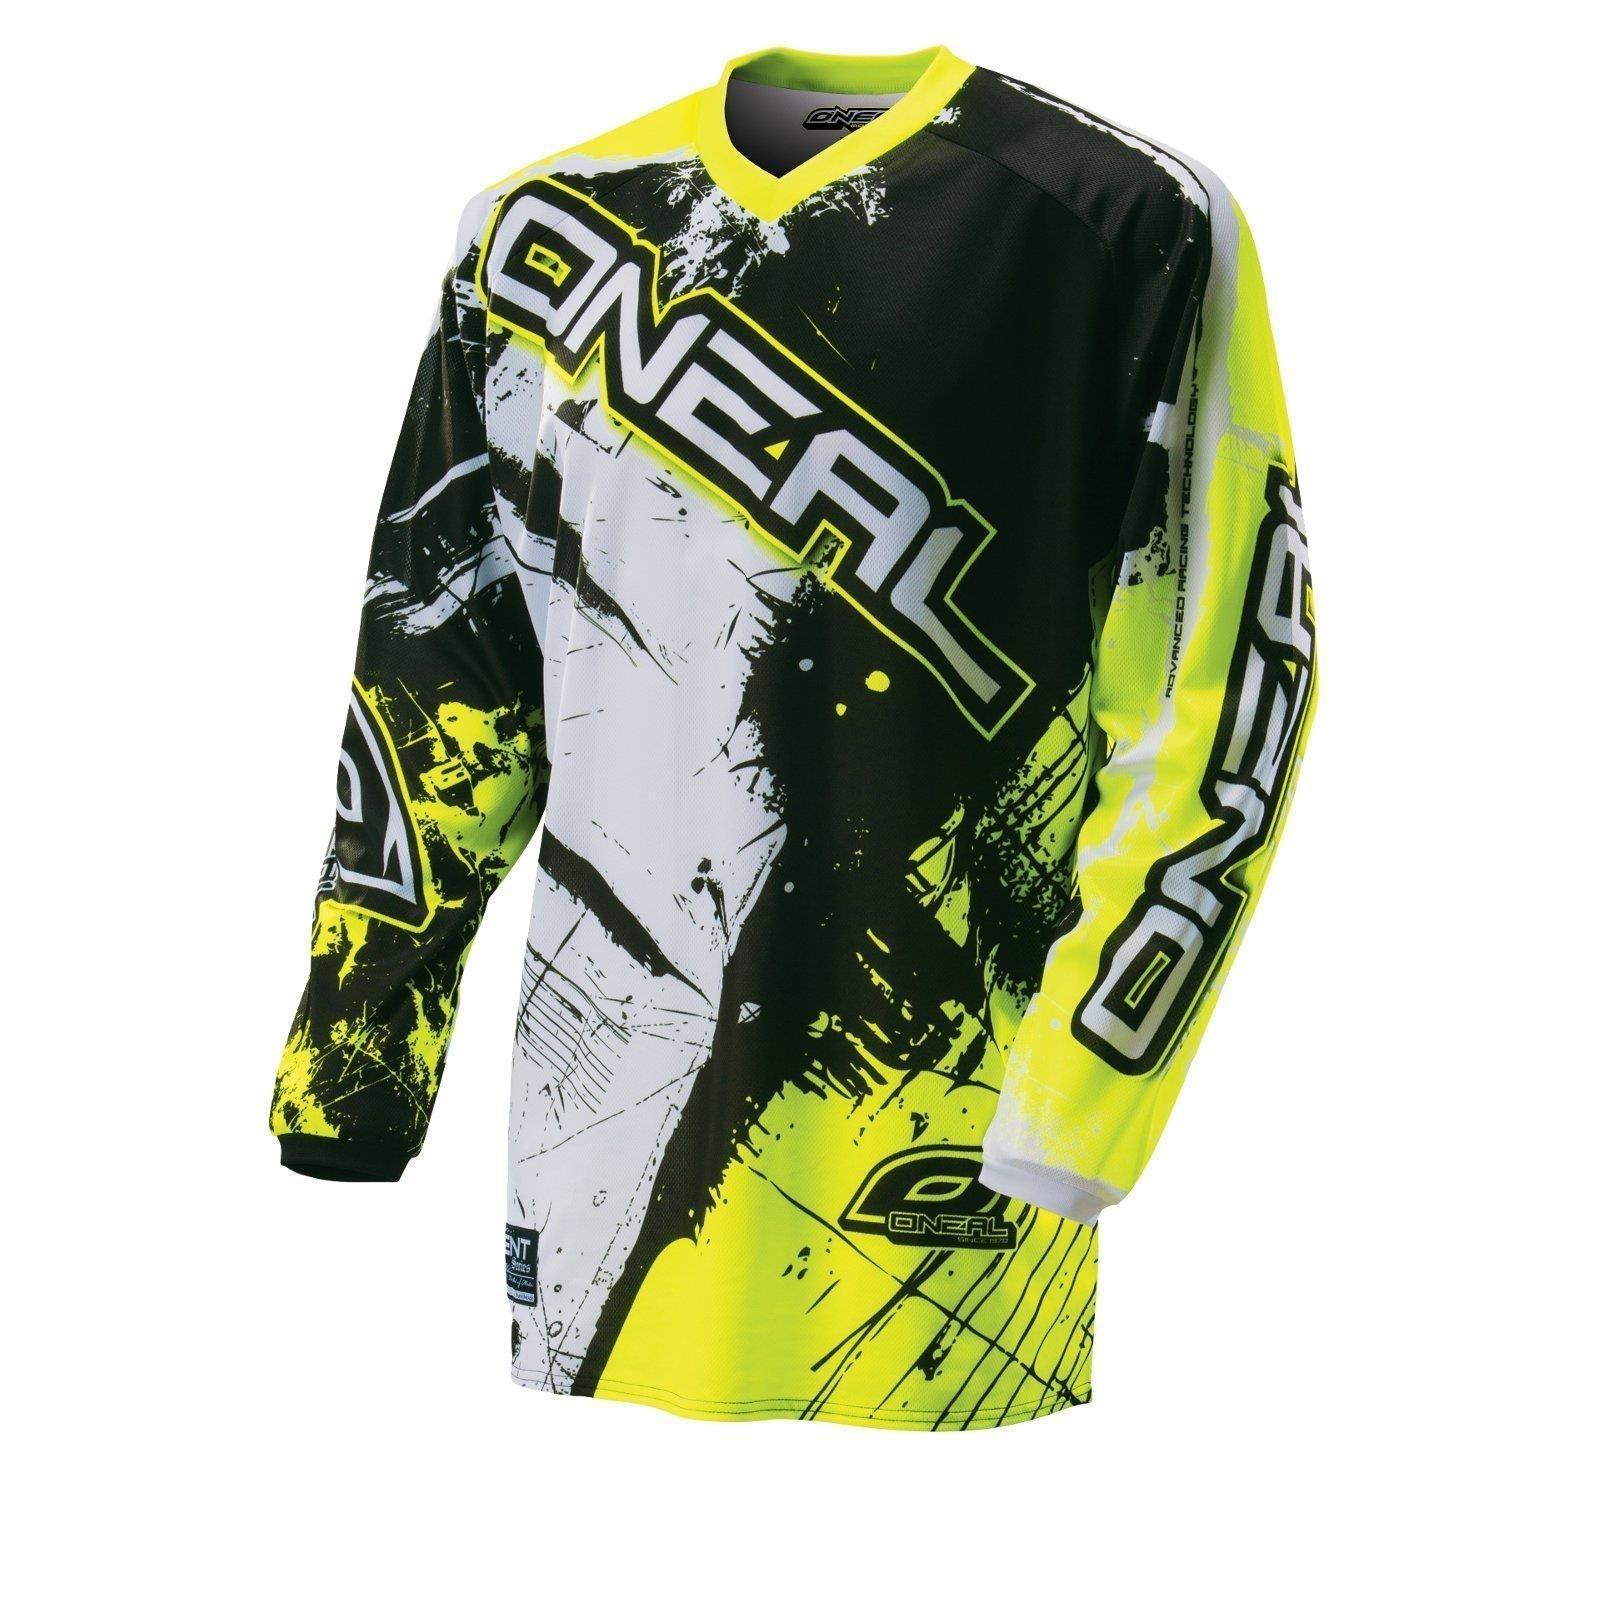 Oneal-elemento-ninos-MX-Jersey-pantalones-Shocker-Moto-Cross-Enduro-Mountainbike-MTB miniatura 12